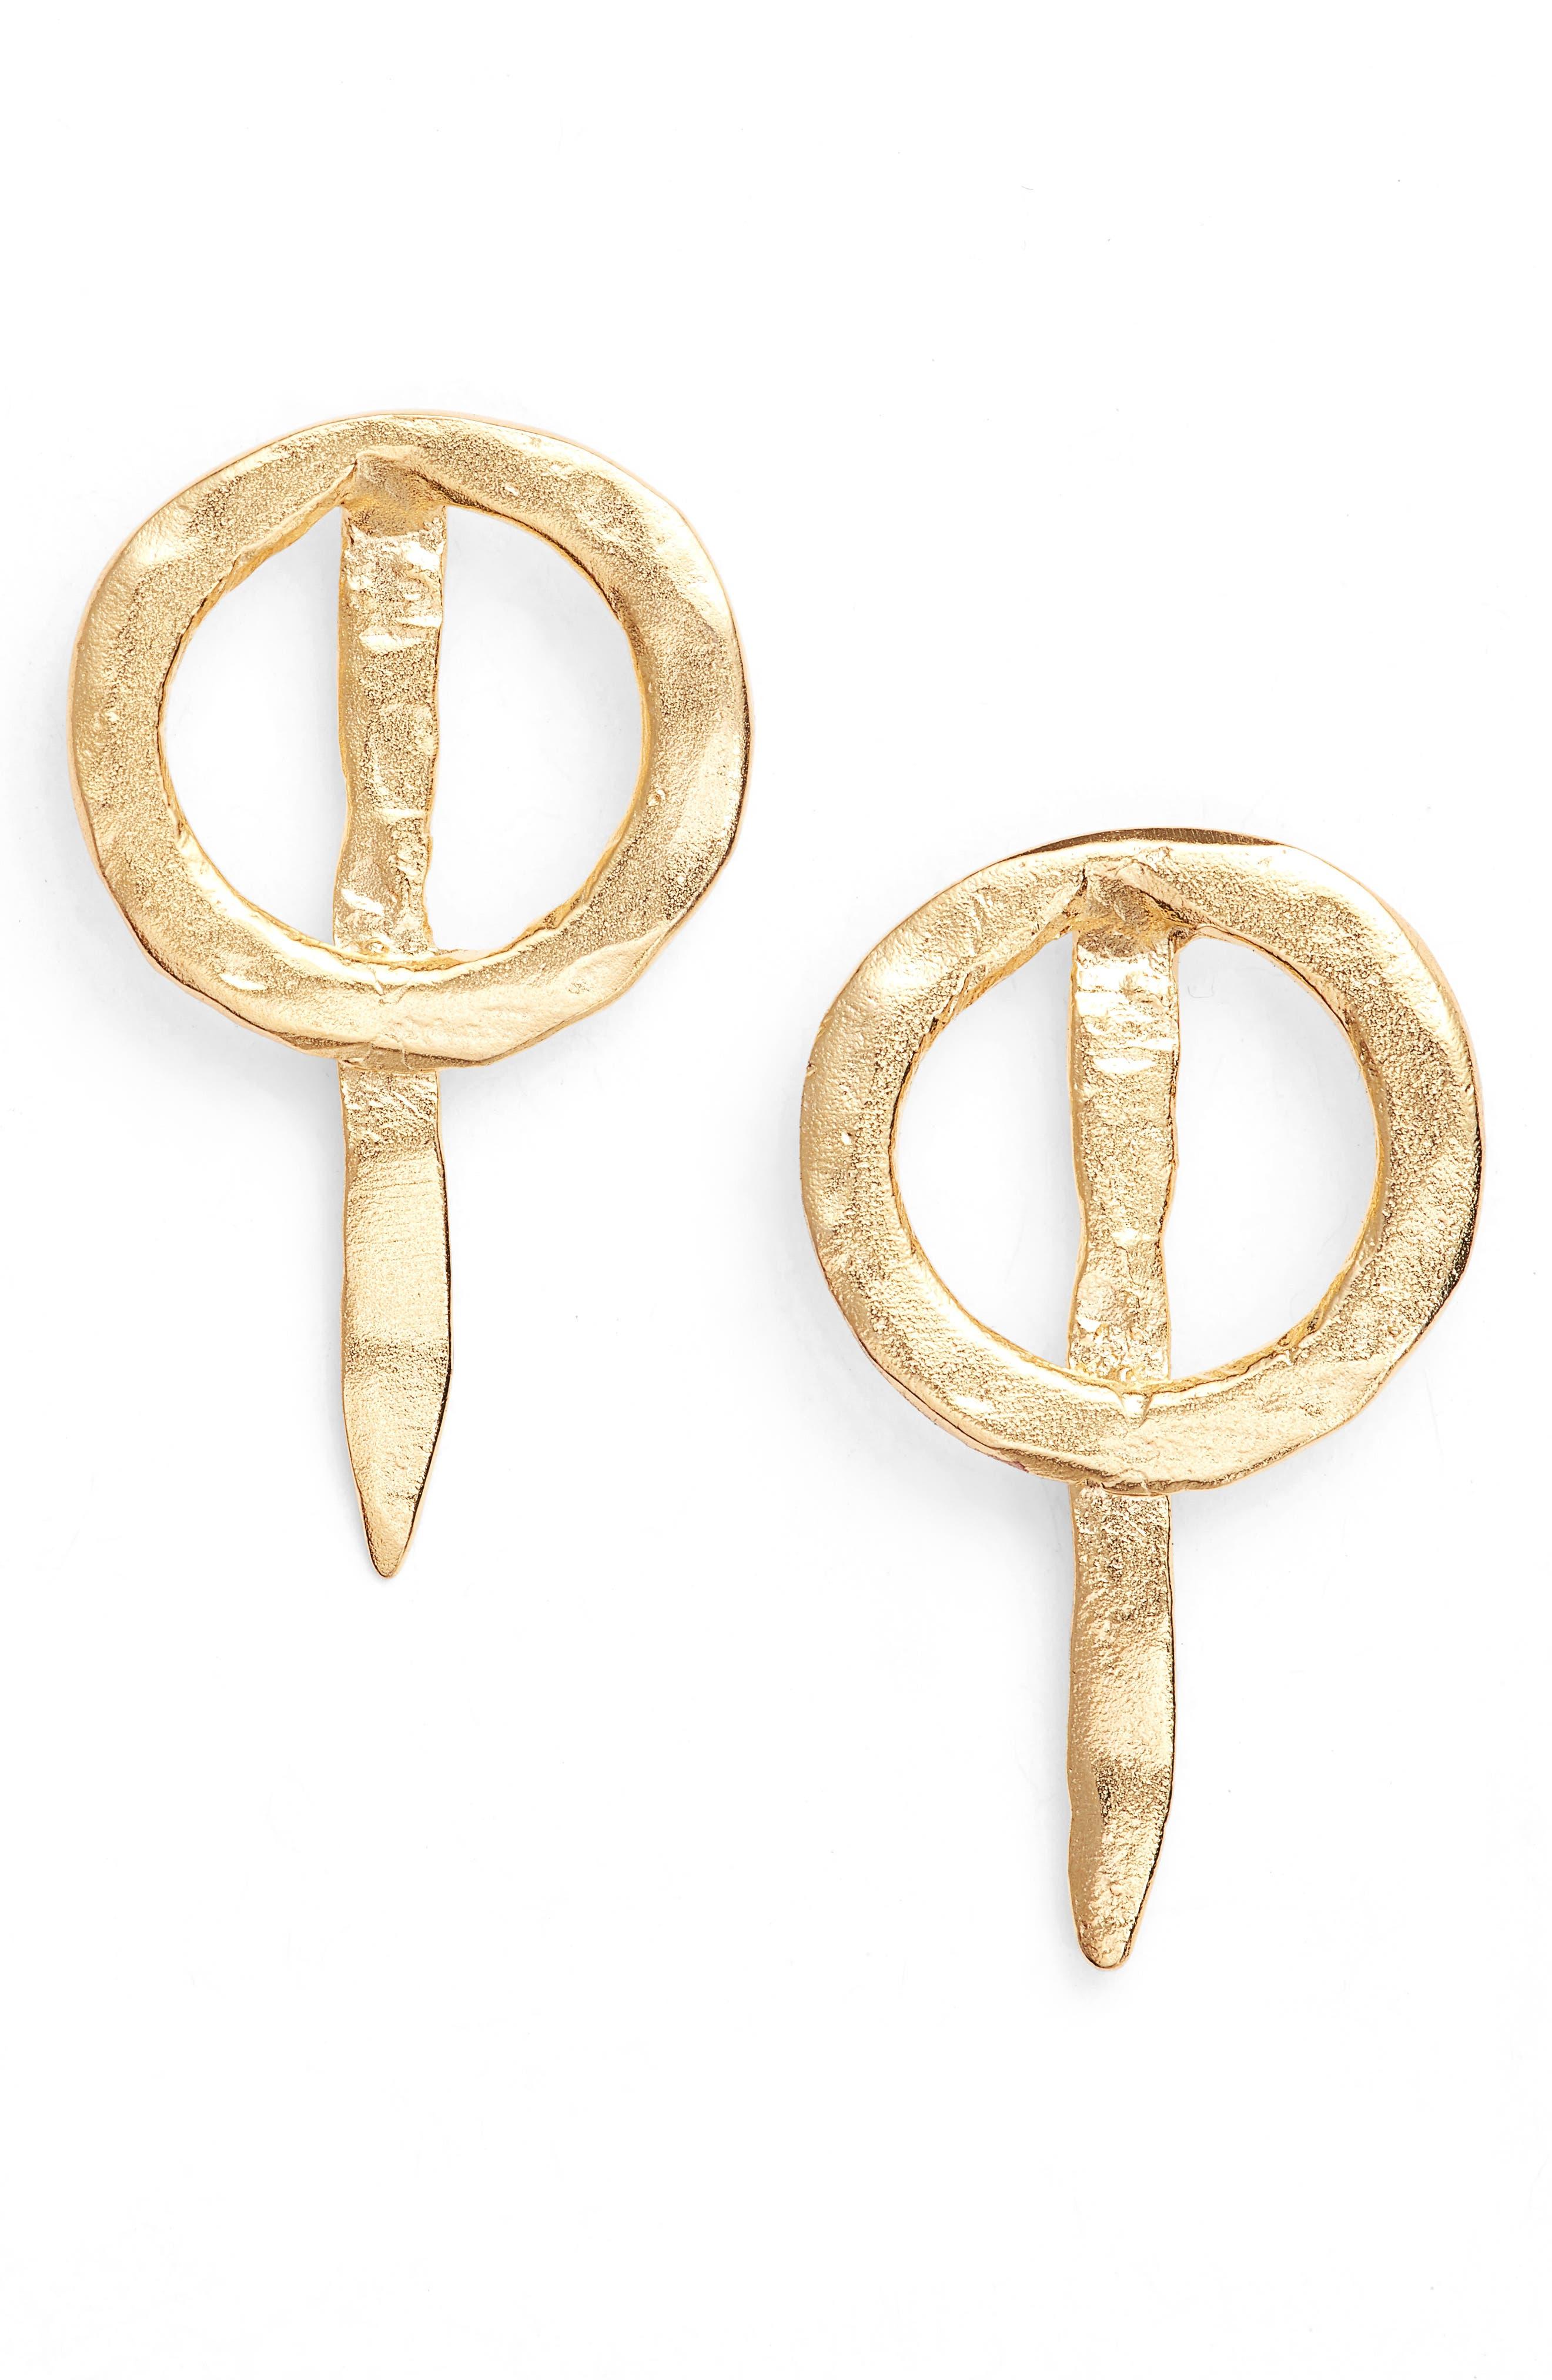 Thorn Drop Earrings,                             Main thumbnail 1, color,                             Gold